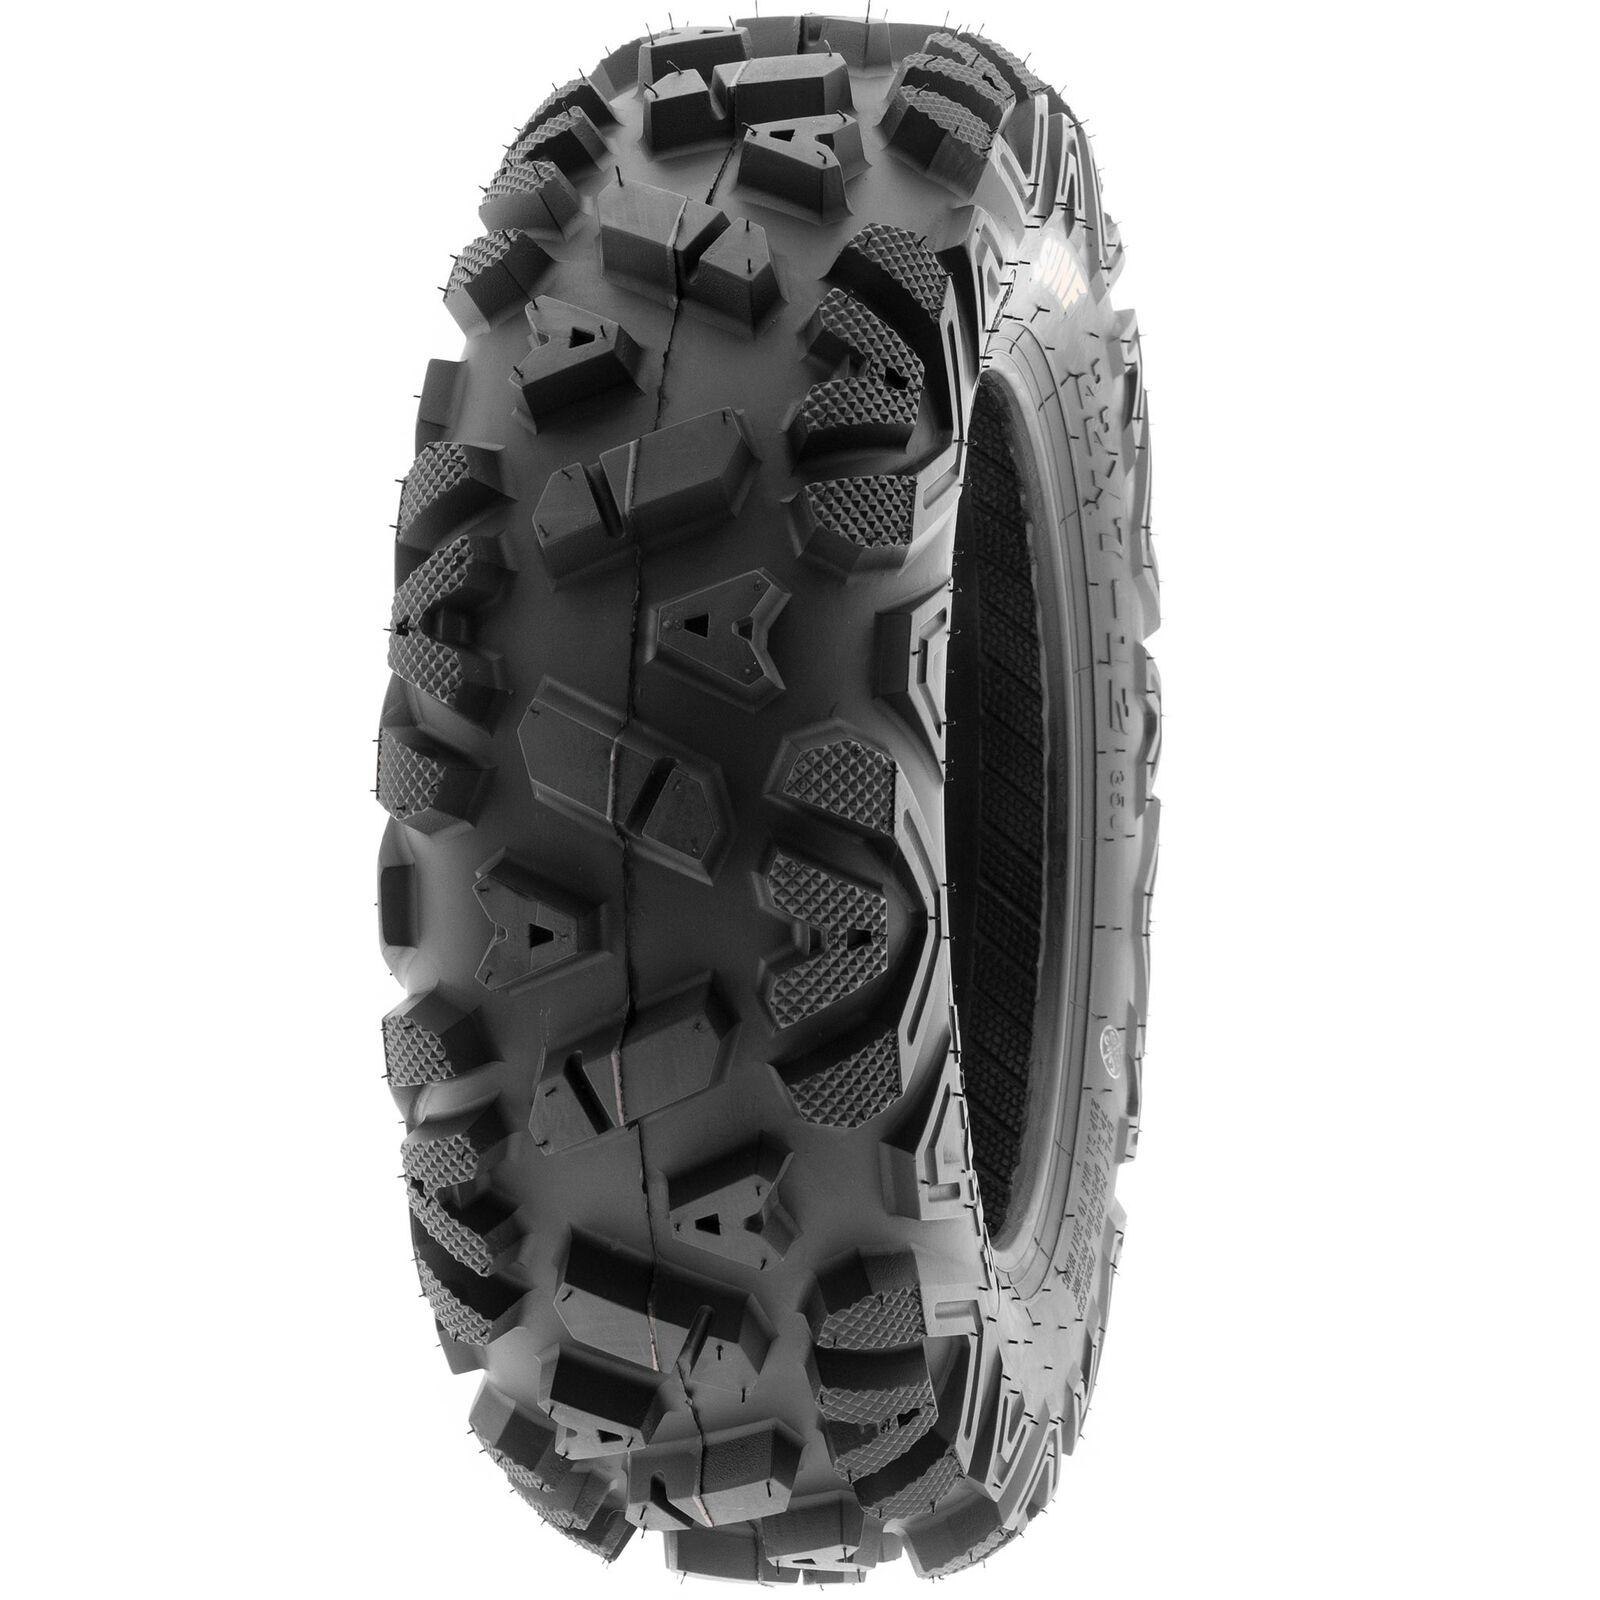 Kenda Bear Claw 25x10-12 K299 ATV Rear Single Tire 6PLY Construction 25x10x12